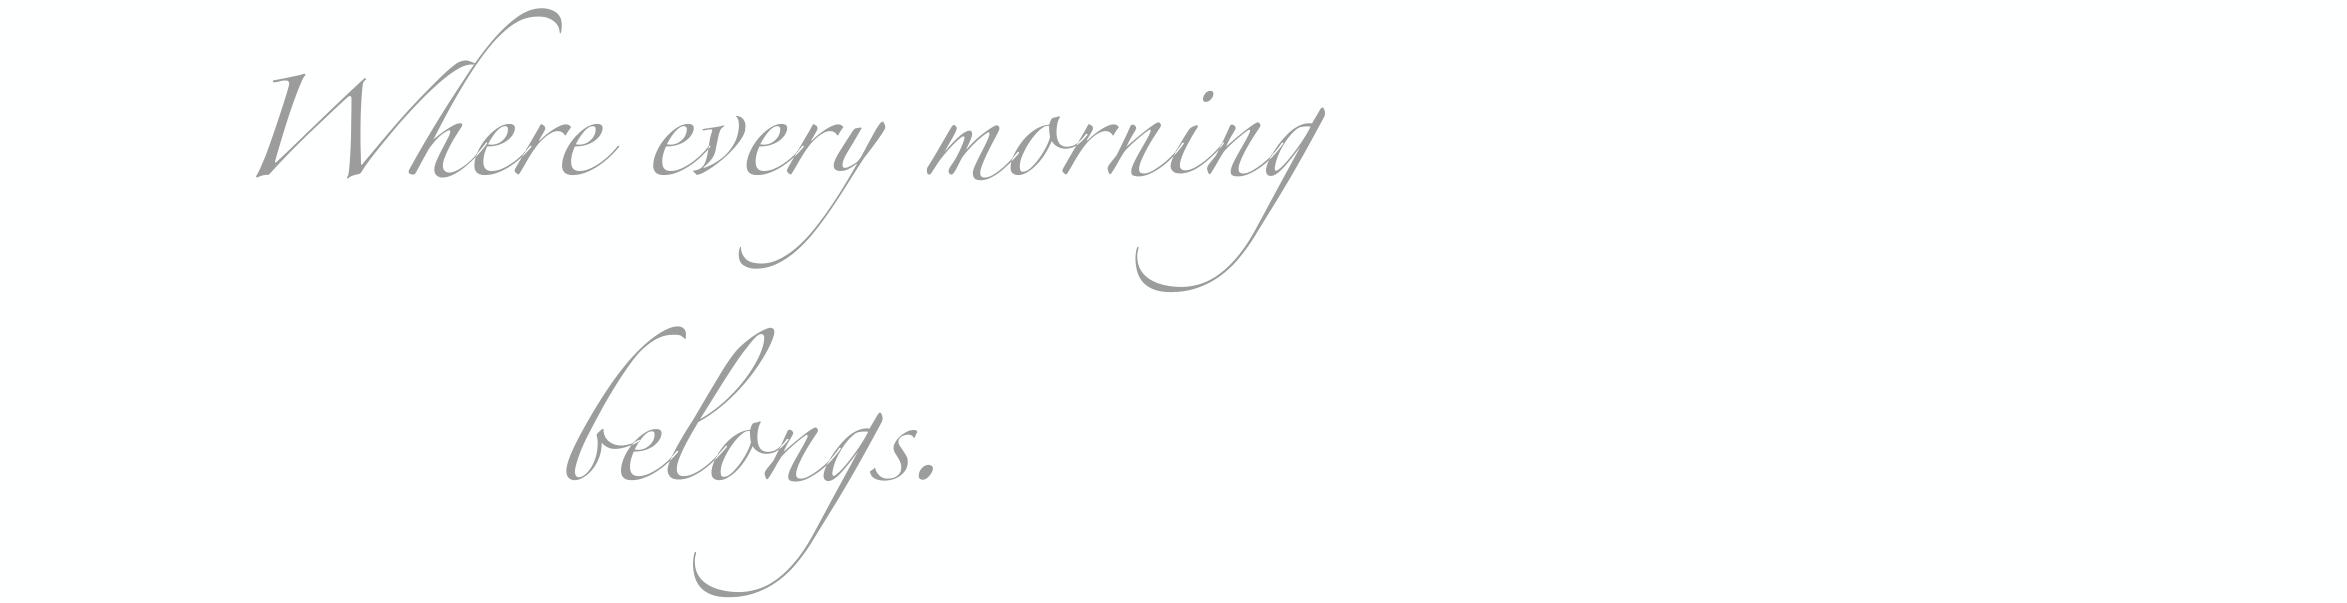 where every morning belongs.